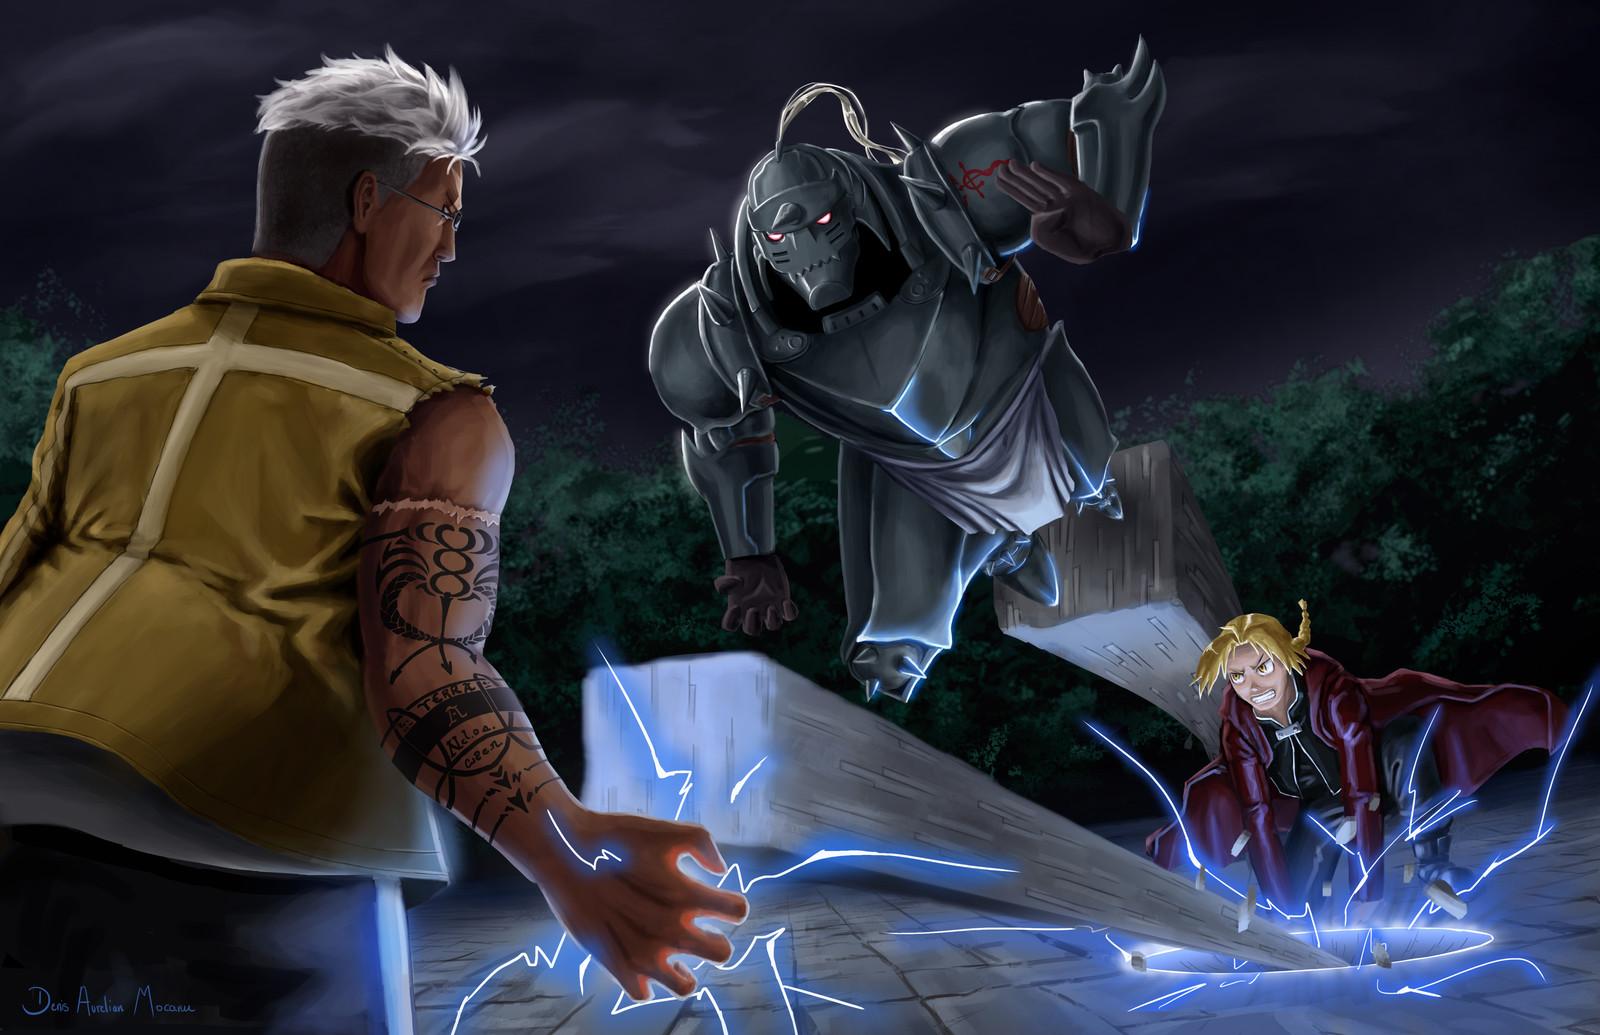 Full metal alchemist fight vs Scar